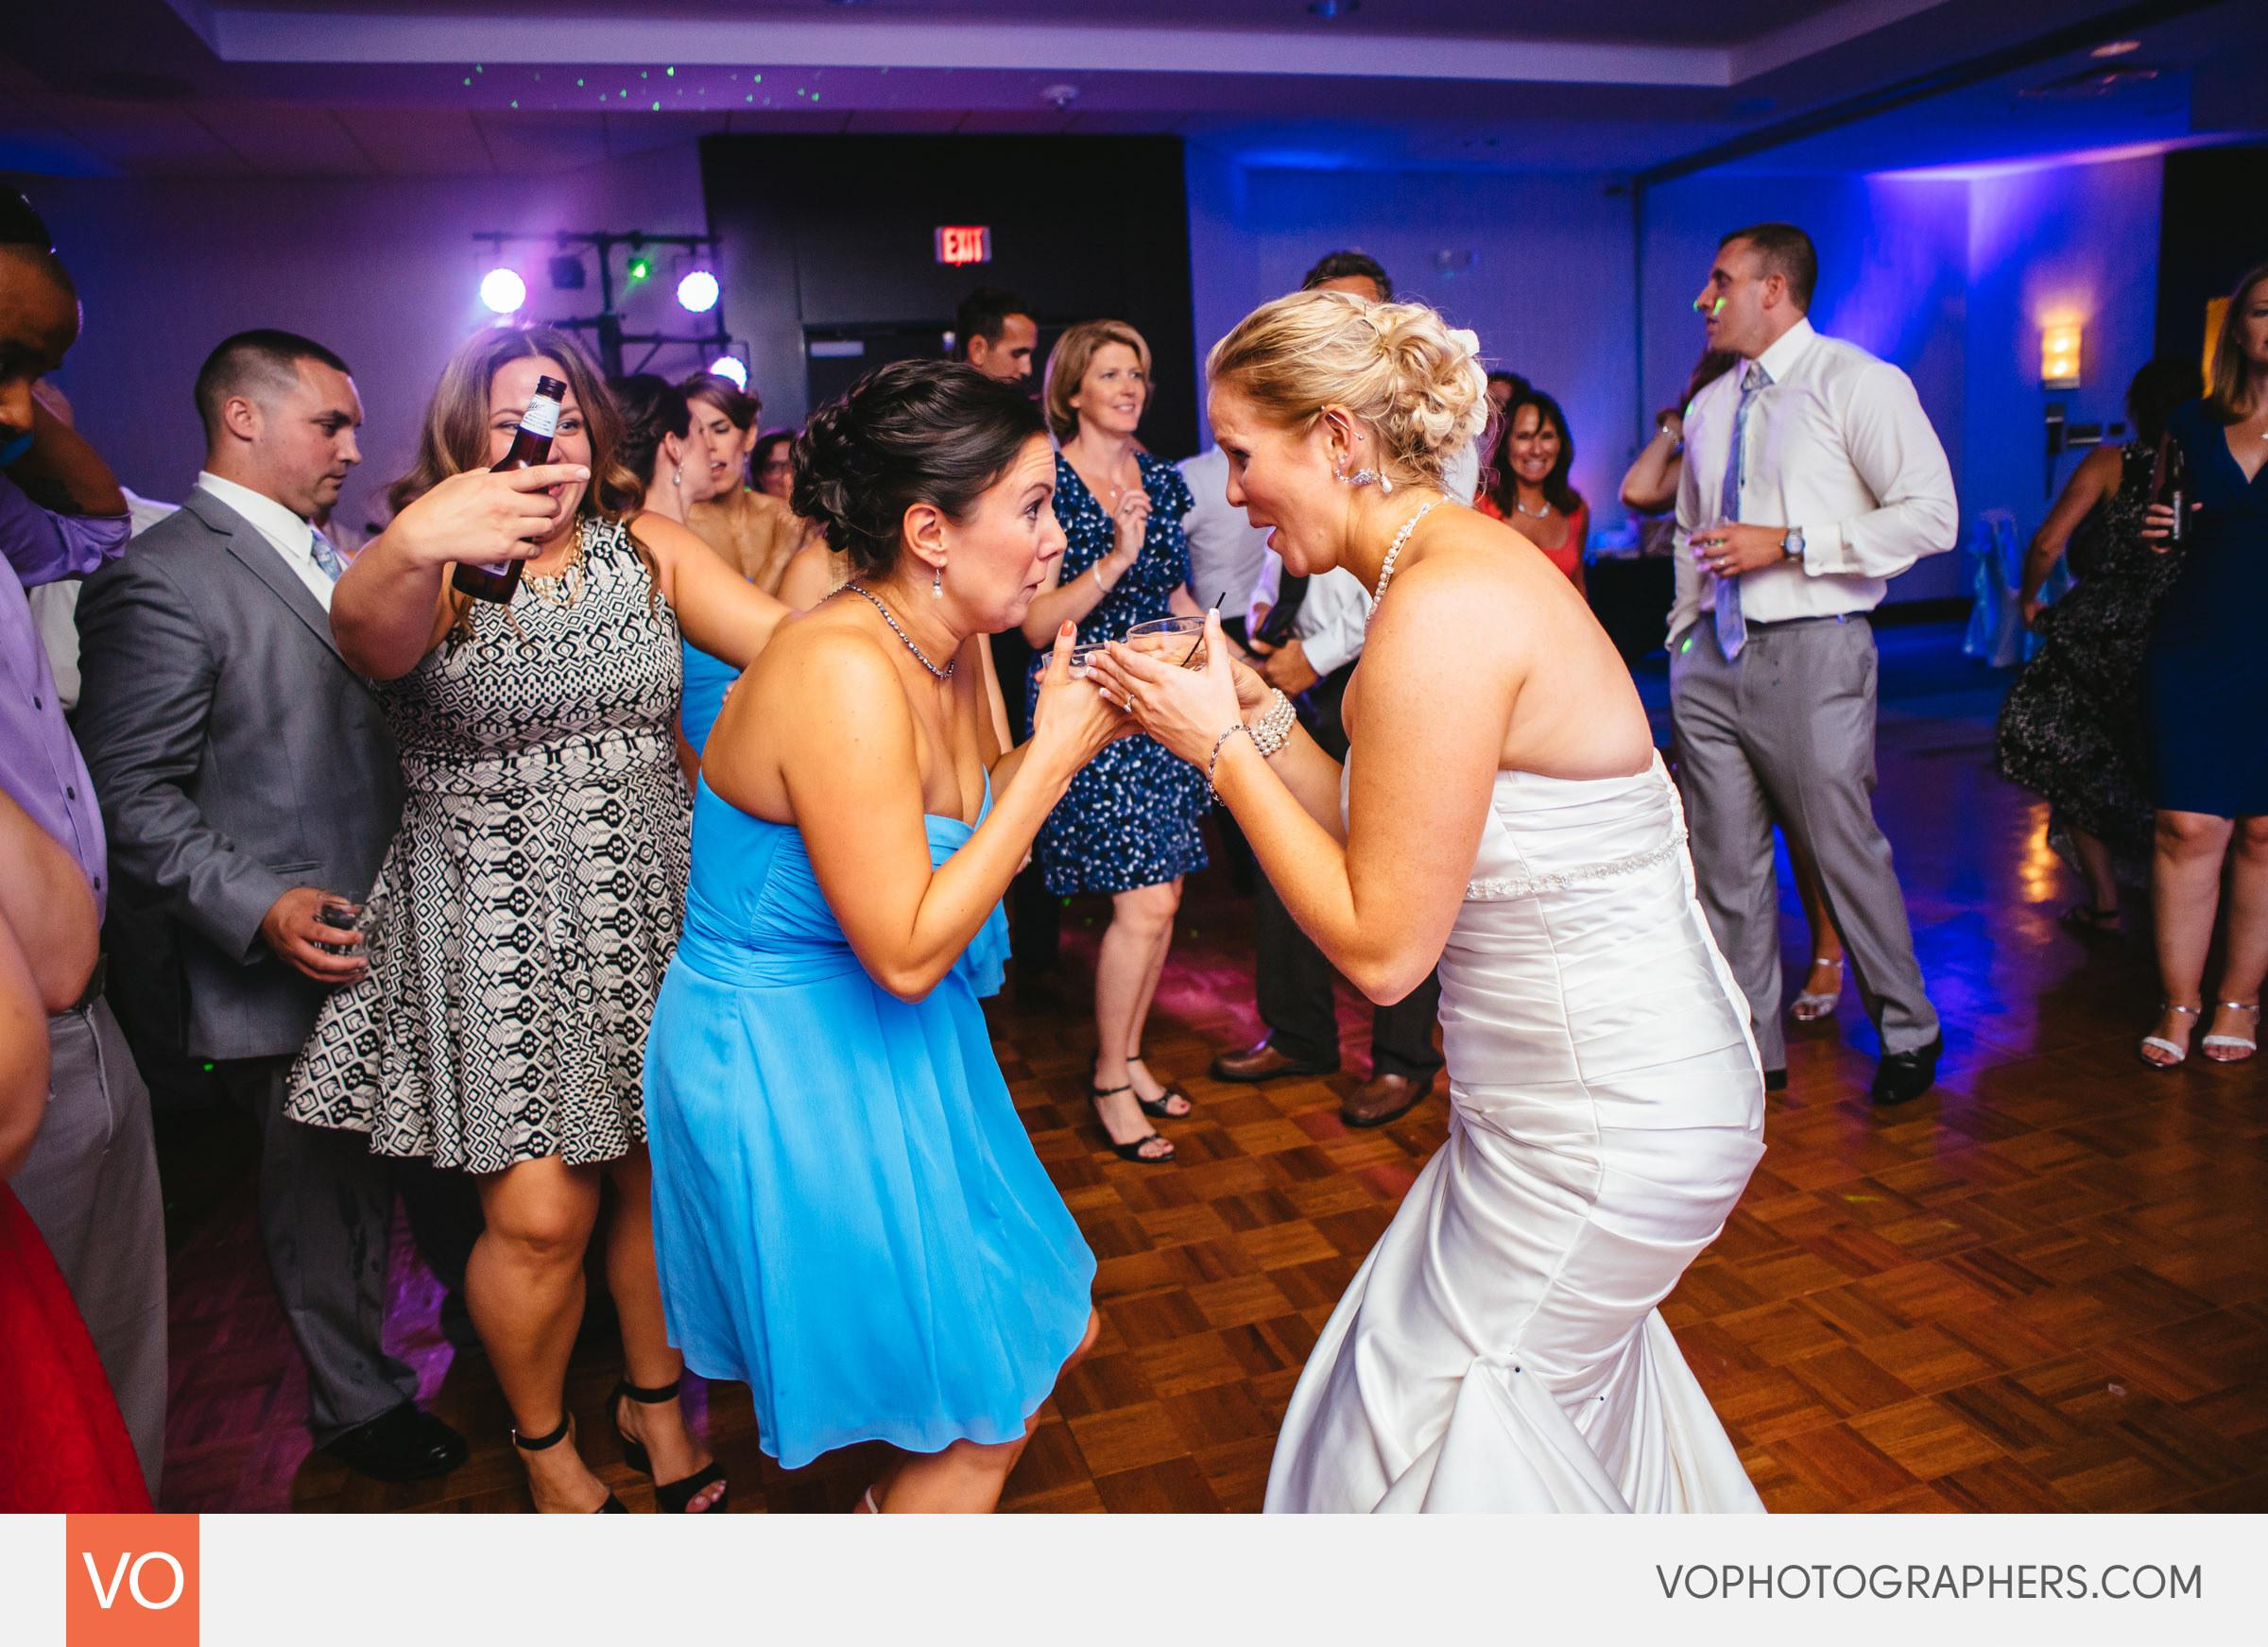 Doubletree-Hotel-Bristol-Wedding-Cathy-Chris-0048